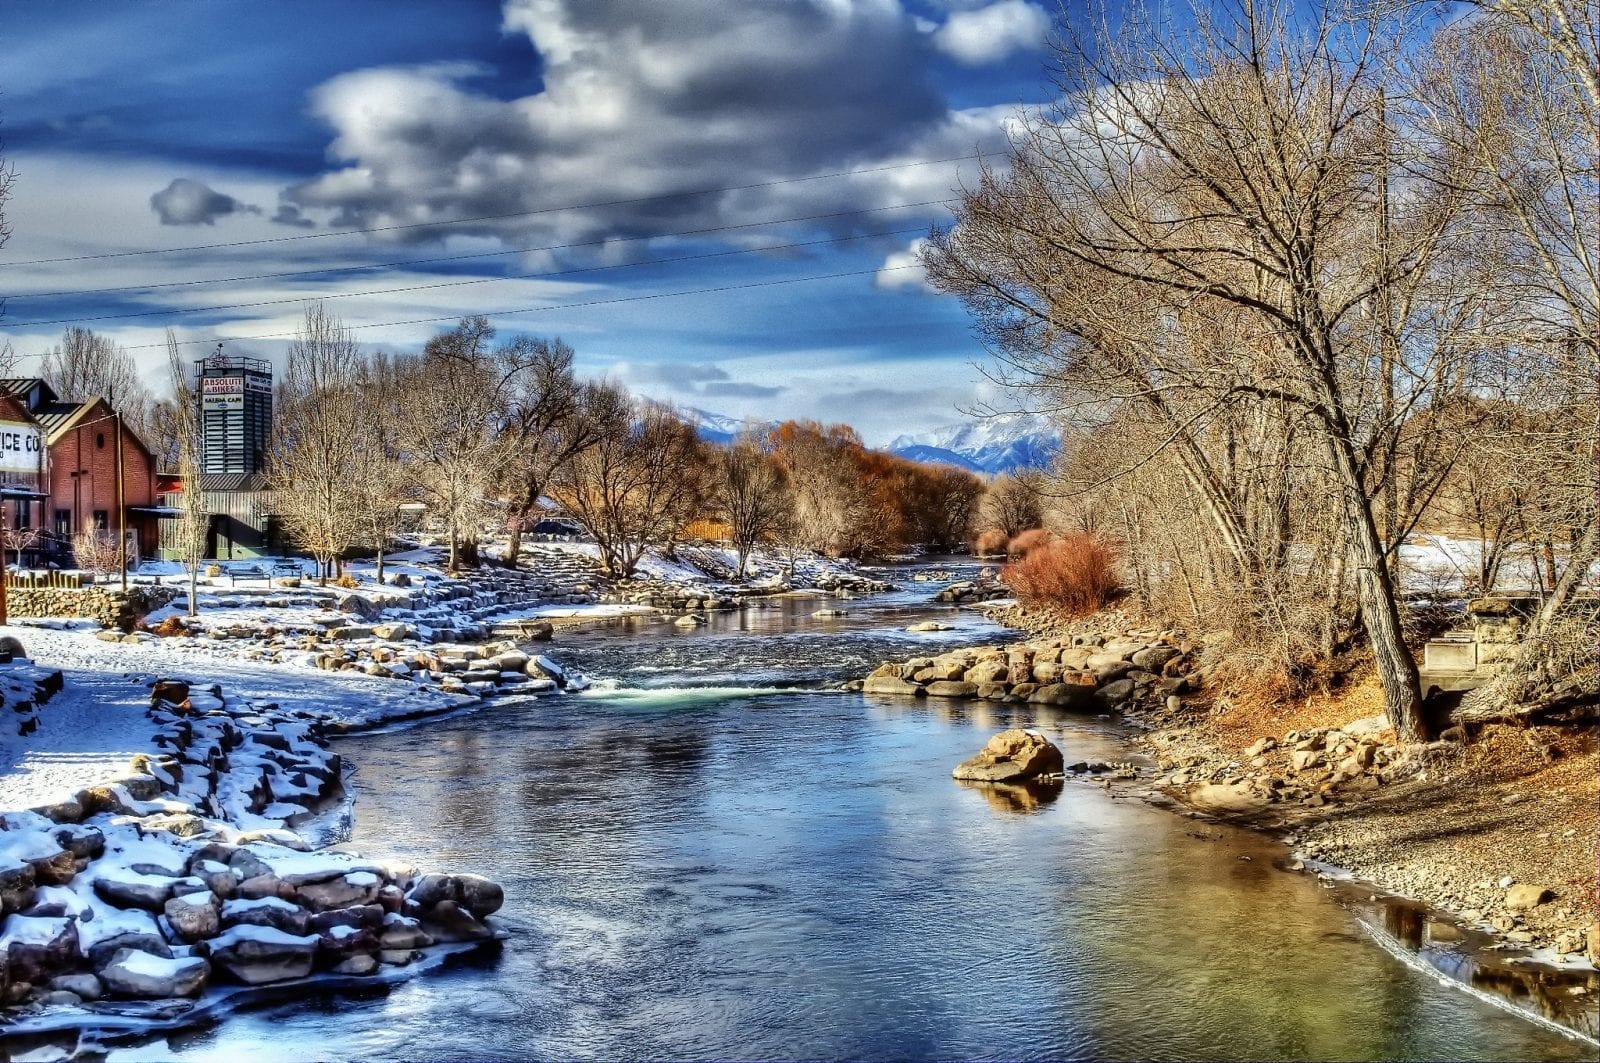 Image of the Arkansas River passing through Salida, Colorado